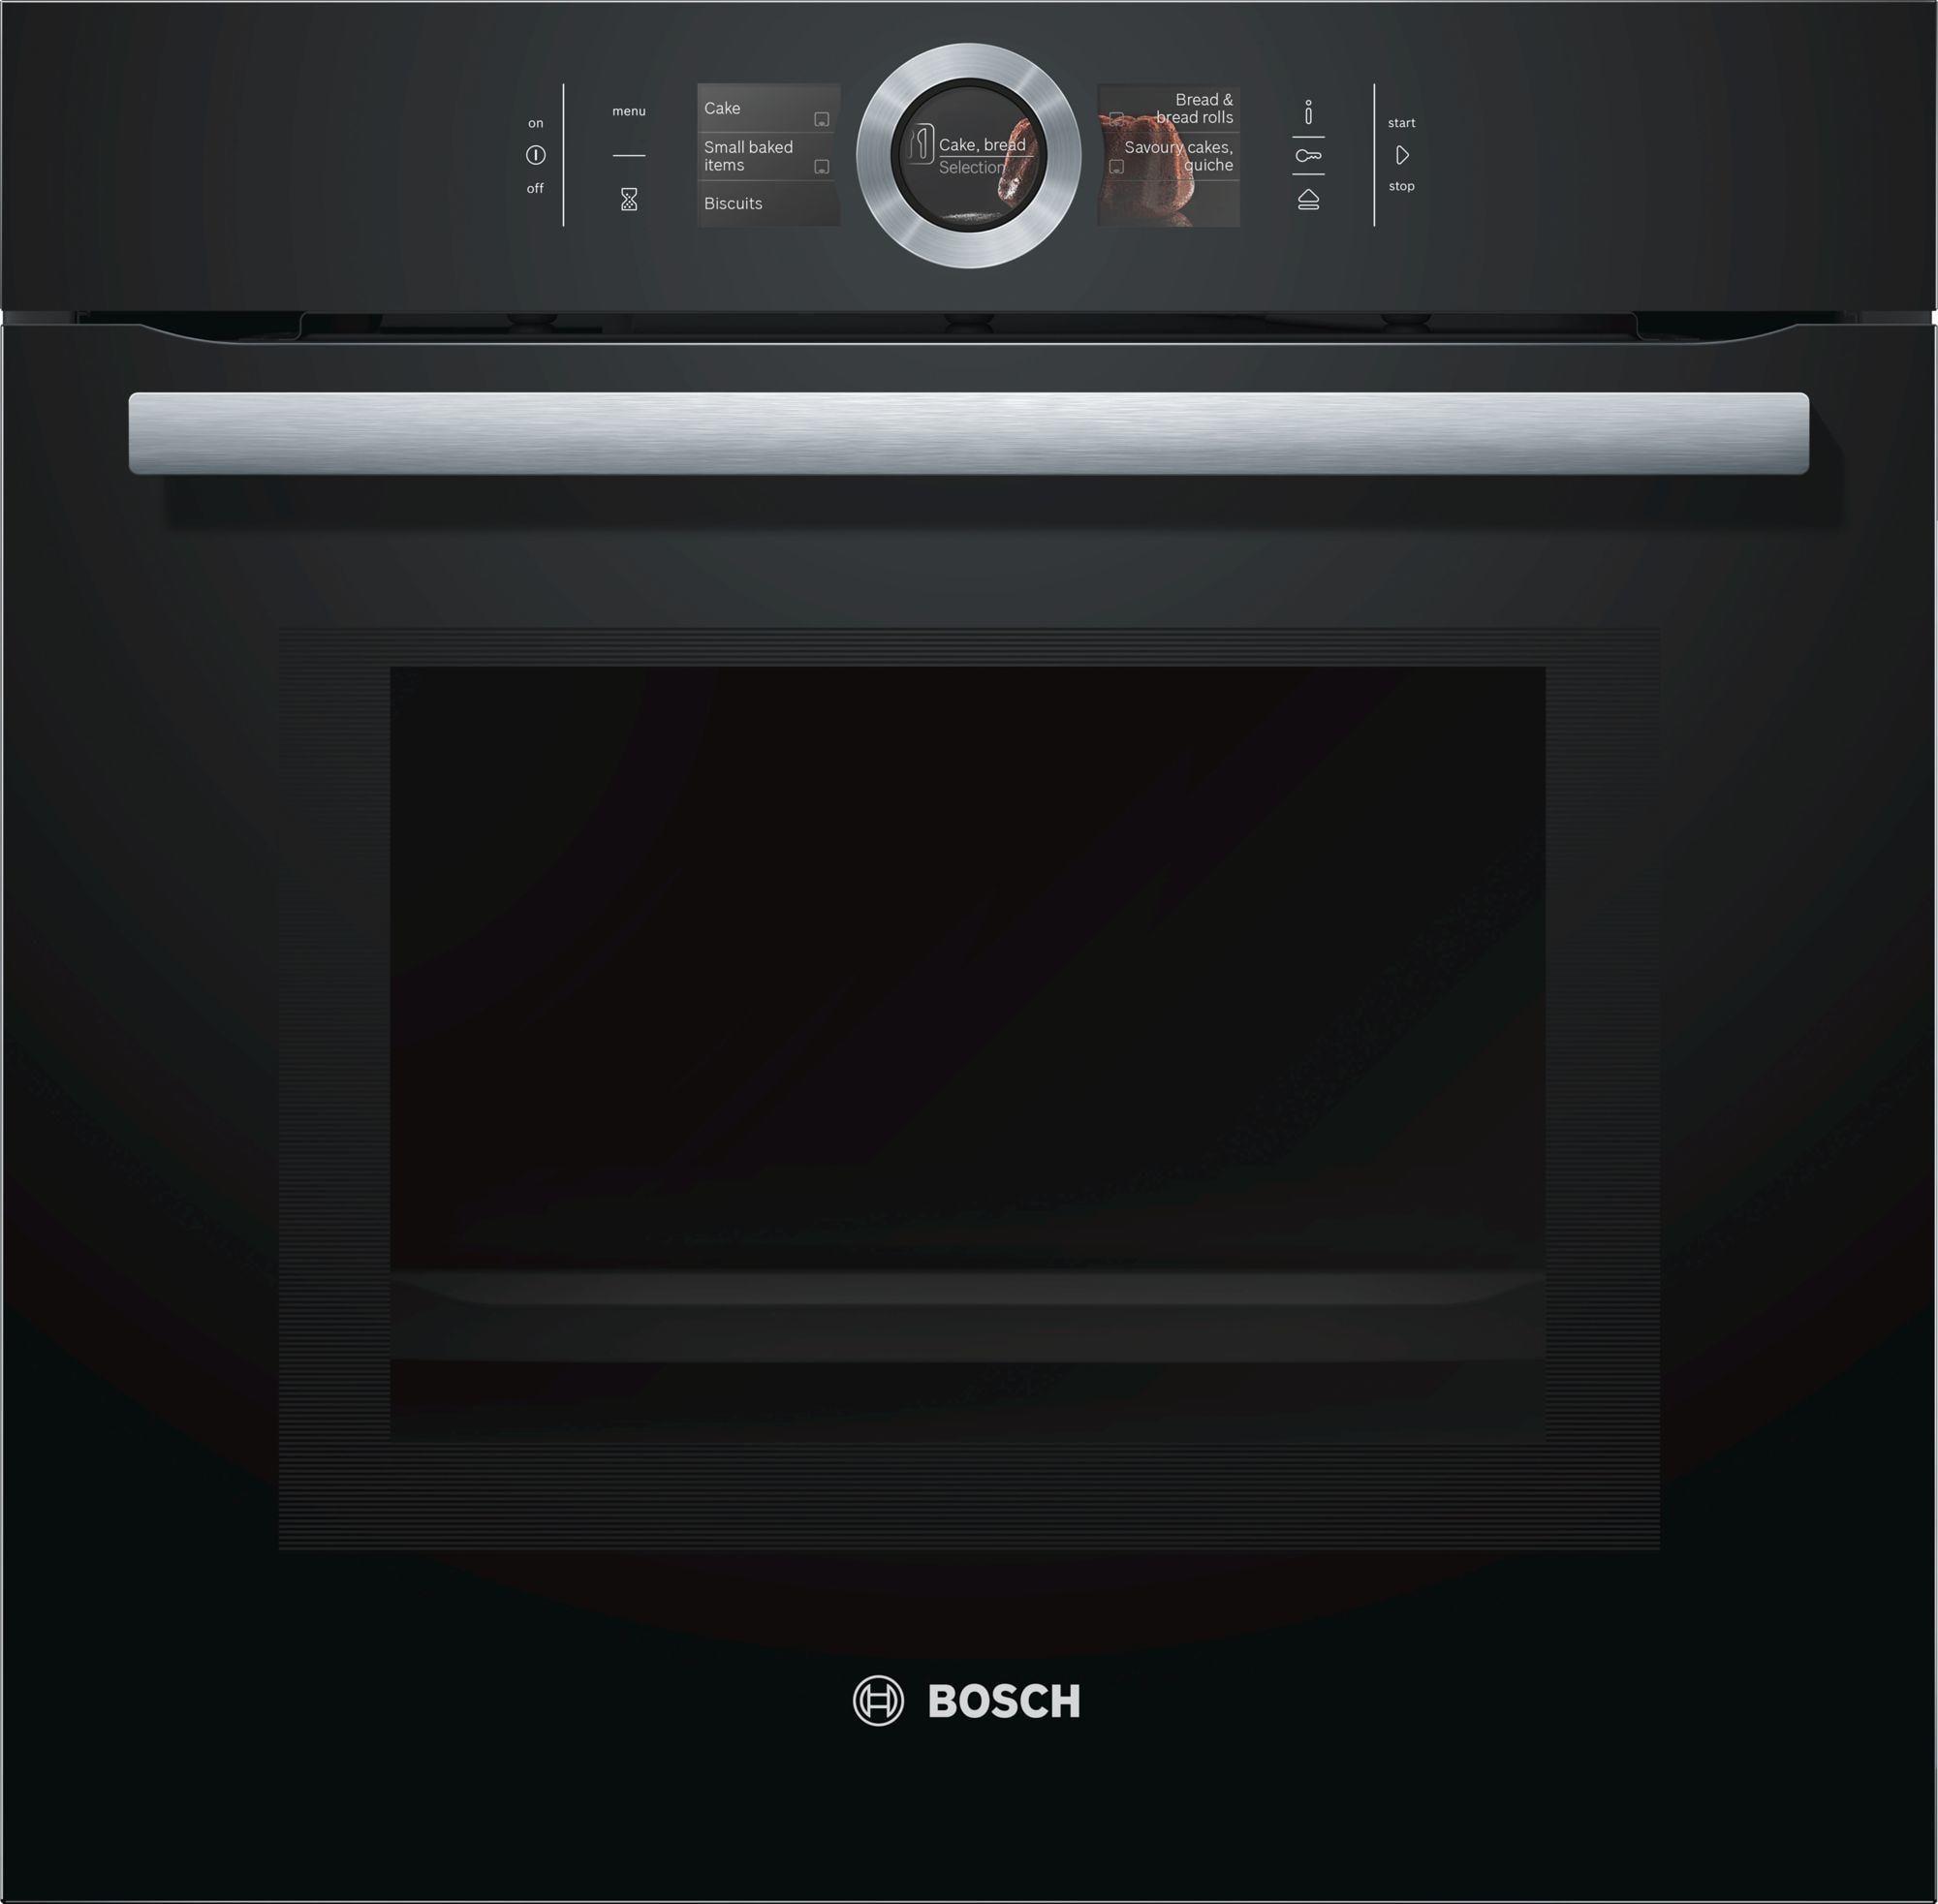 bosch hng6764b6 serie 8 mikrowellen backofen mit dampfunterst tzung vulkan schwarz sensor. Black Bedroom Furniture Sets. Home Design Ideas